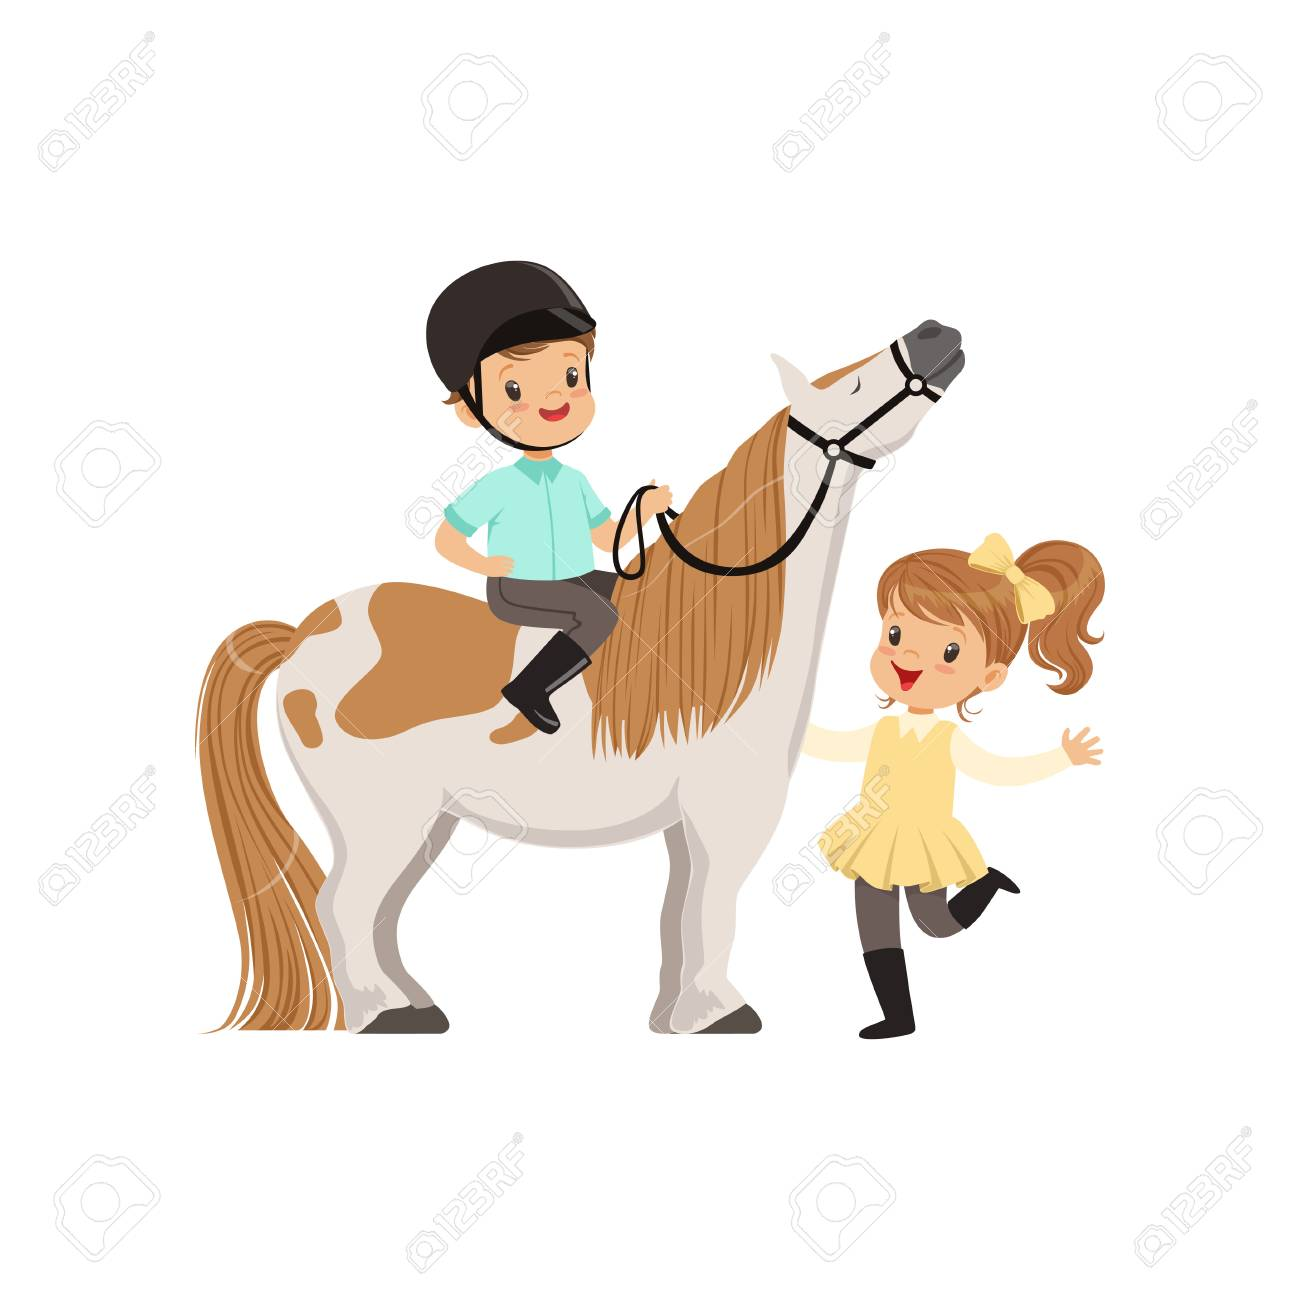 Cheerful little boy jockey sitting on pony horse, beautiful girl standing next to him, children's equestrian sport vector Illustration - 95688729